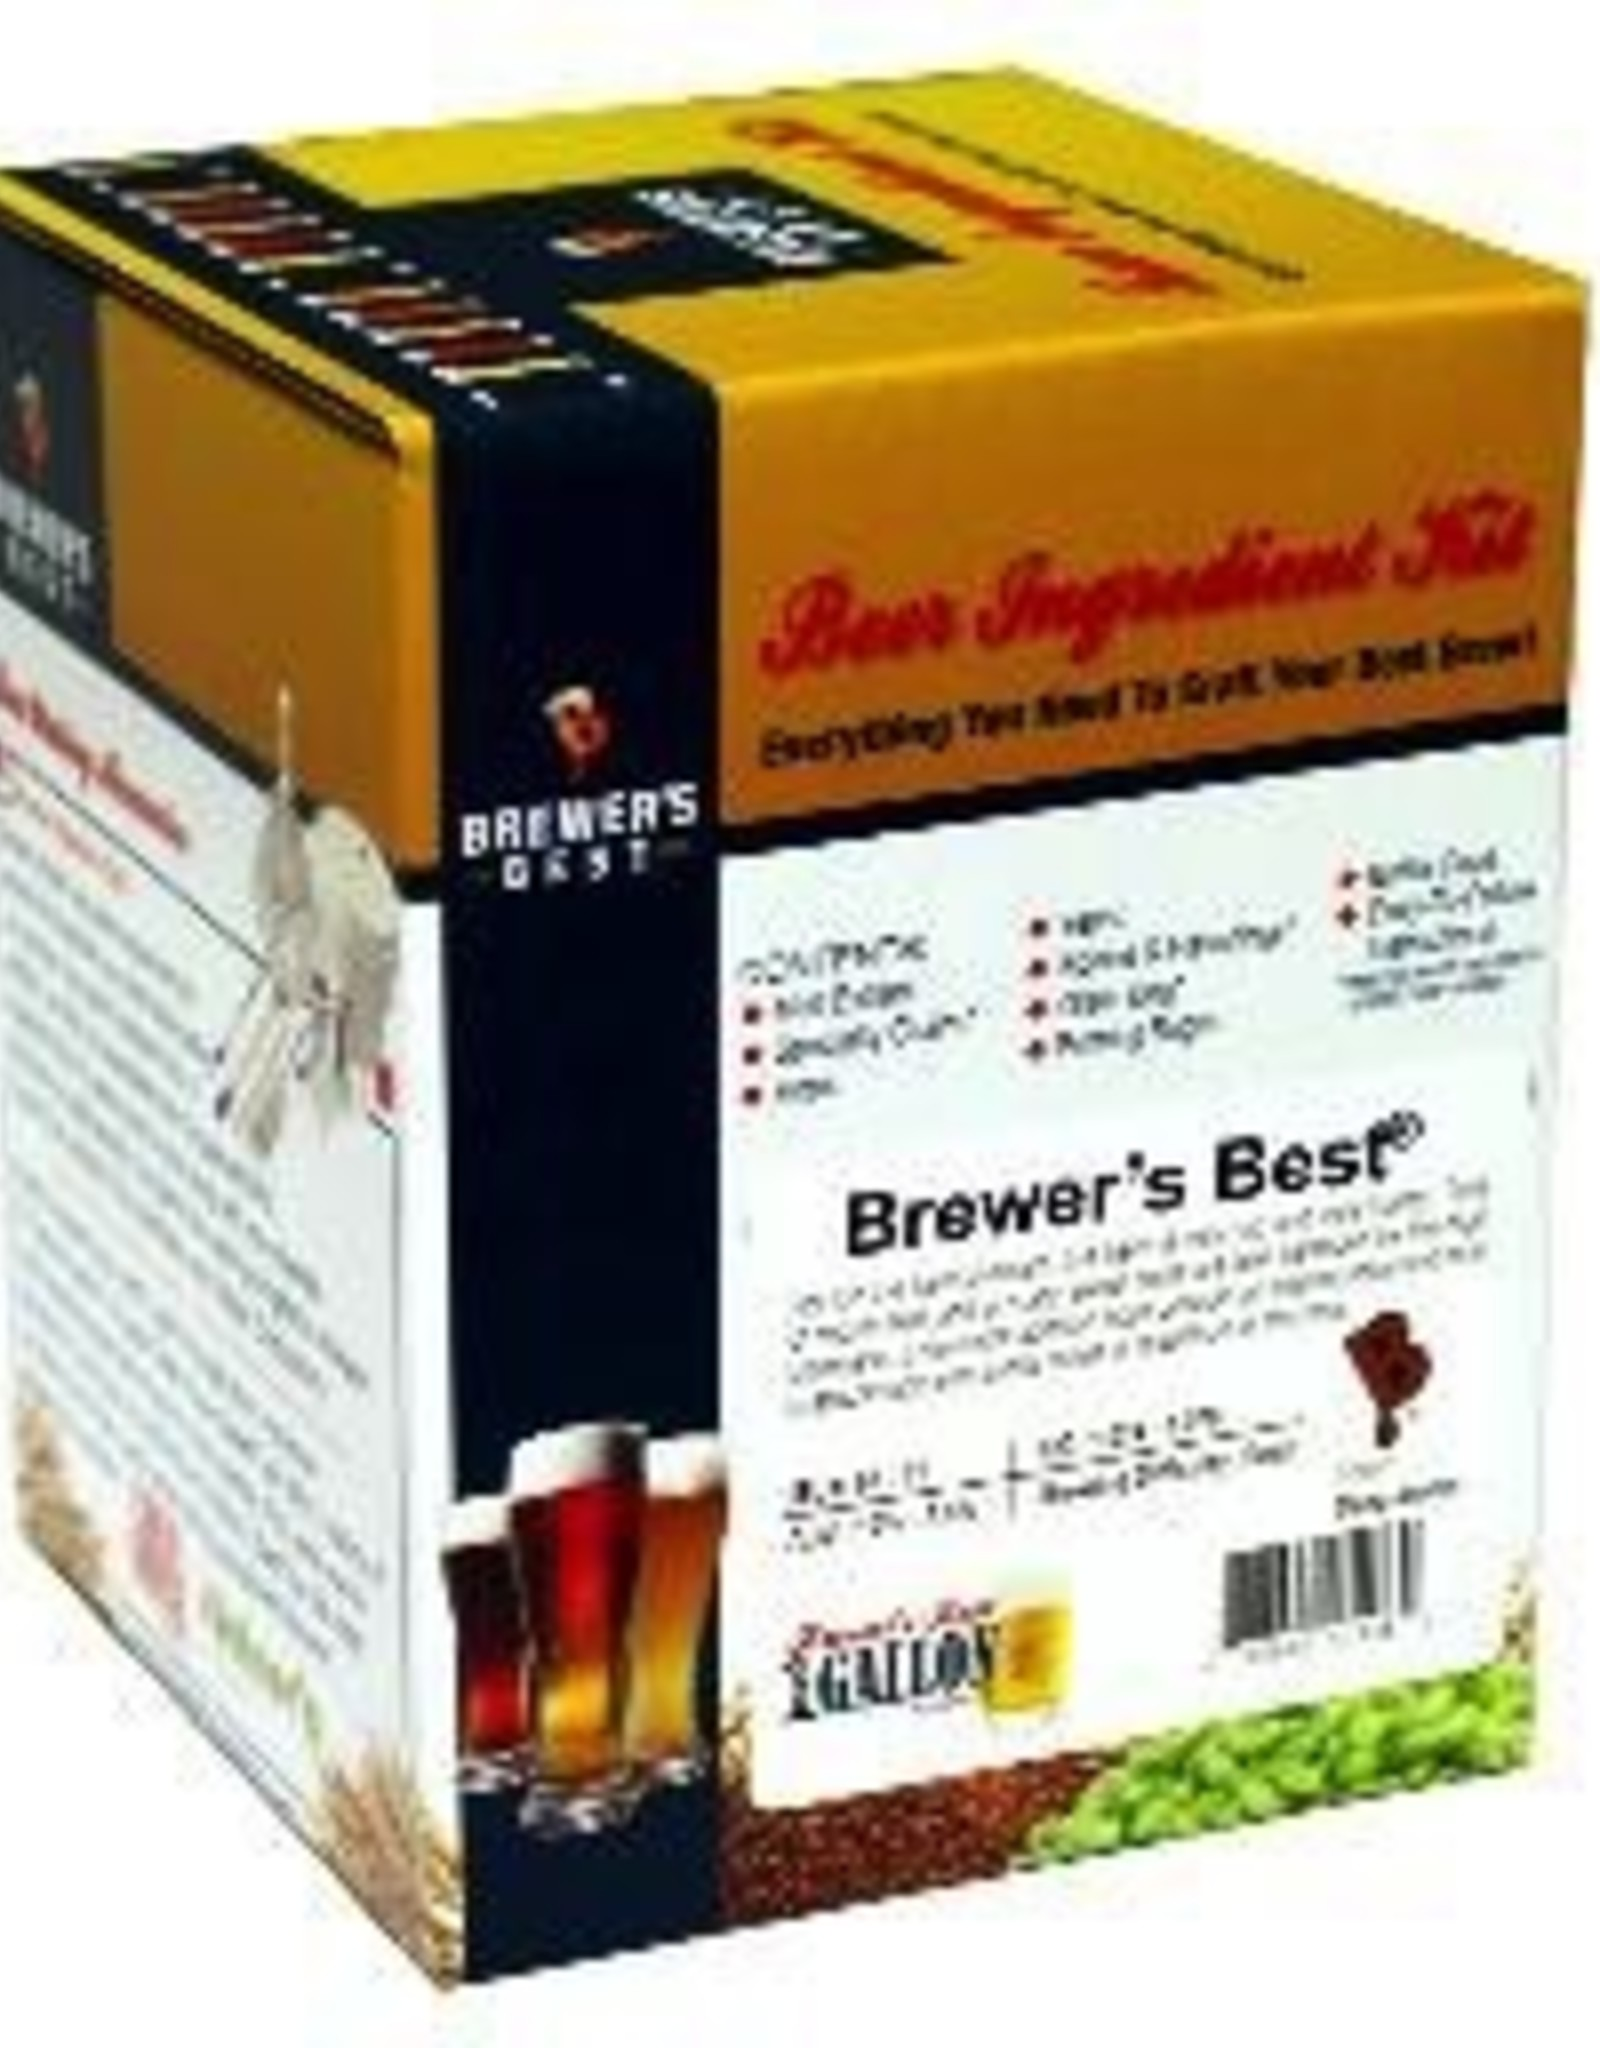 BREWERS BEST AMERICAN WHEAT BEER ONE GALLON INGREDIENT PACKAGE